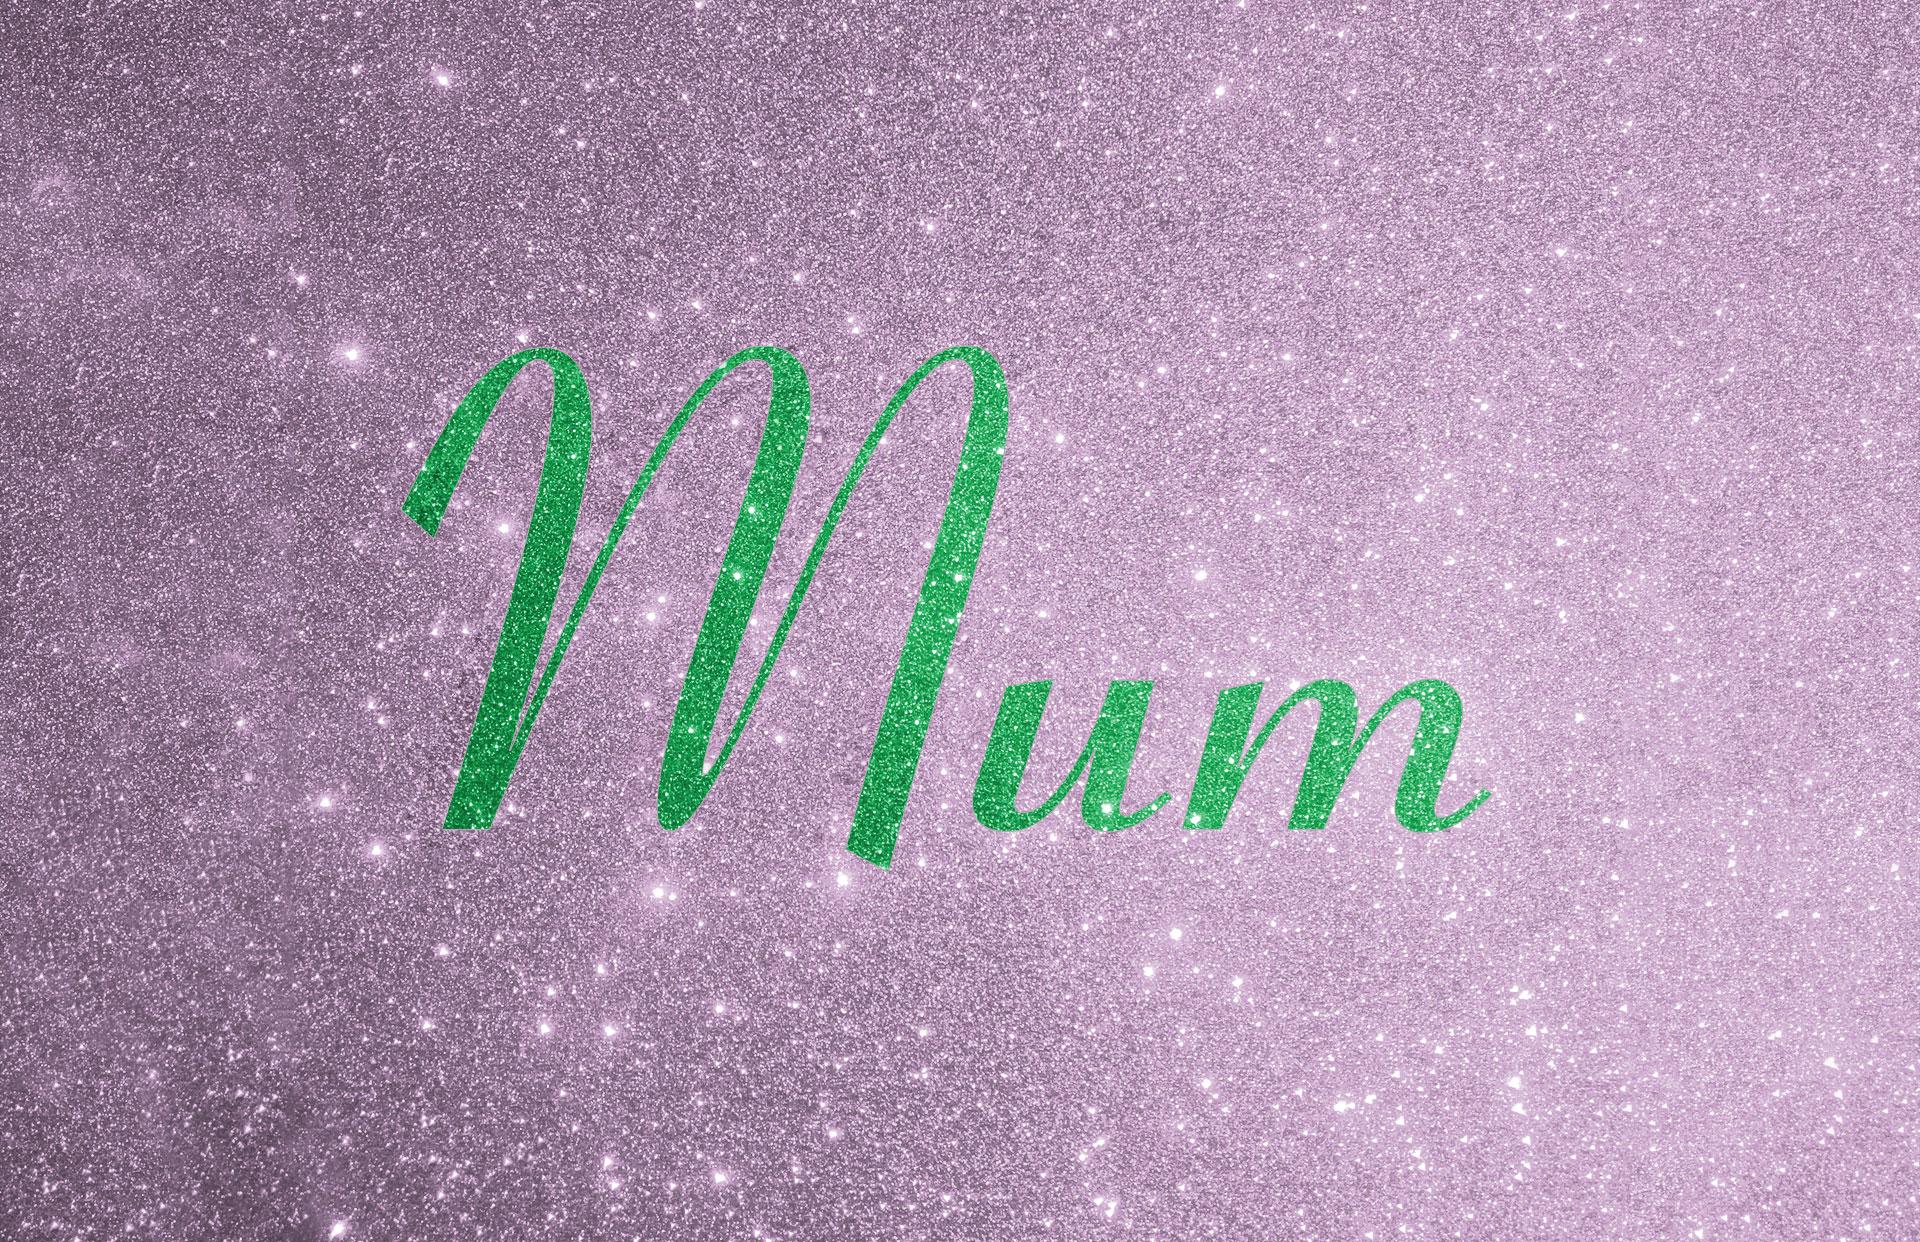 Glitter contrast wording shown in green